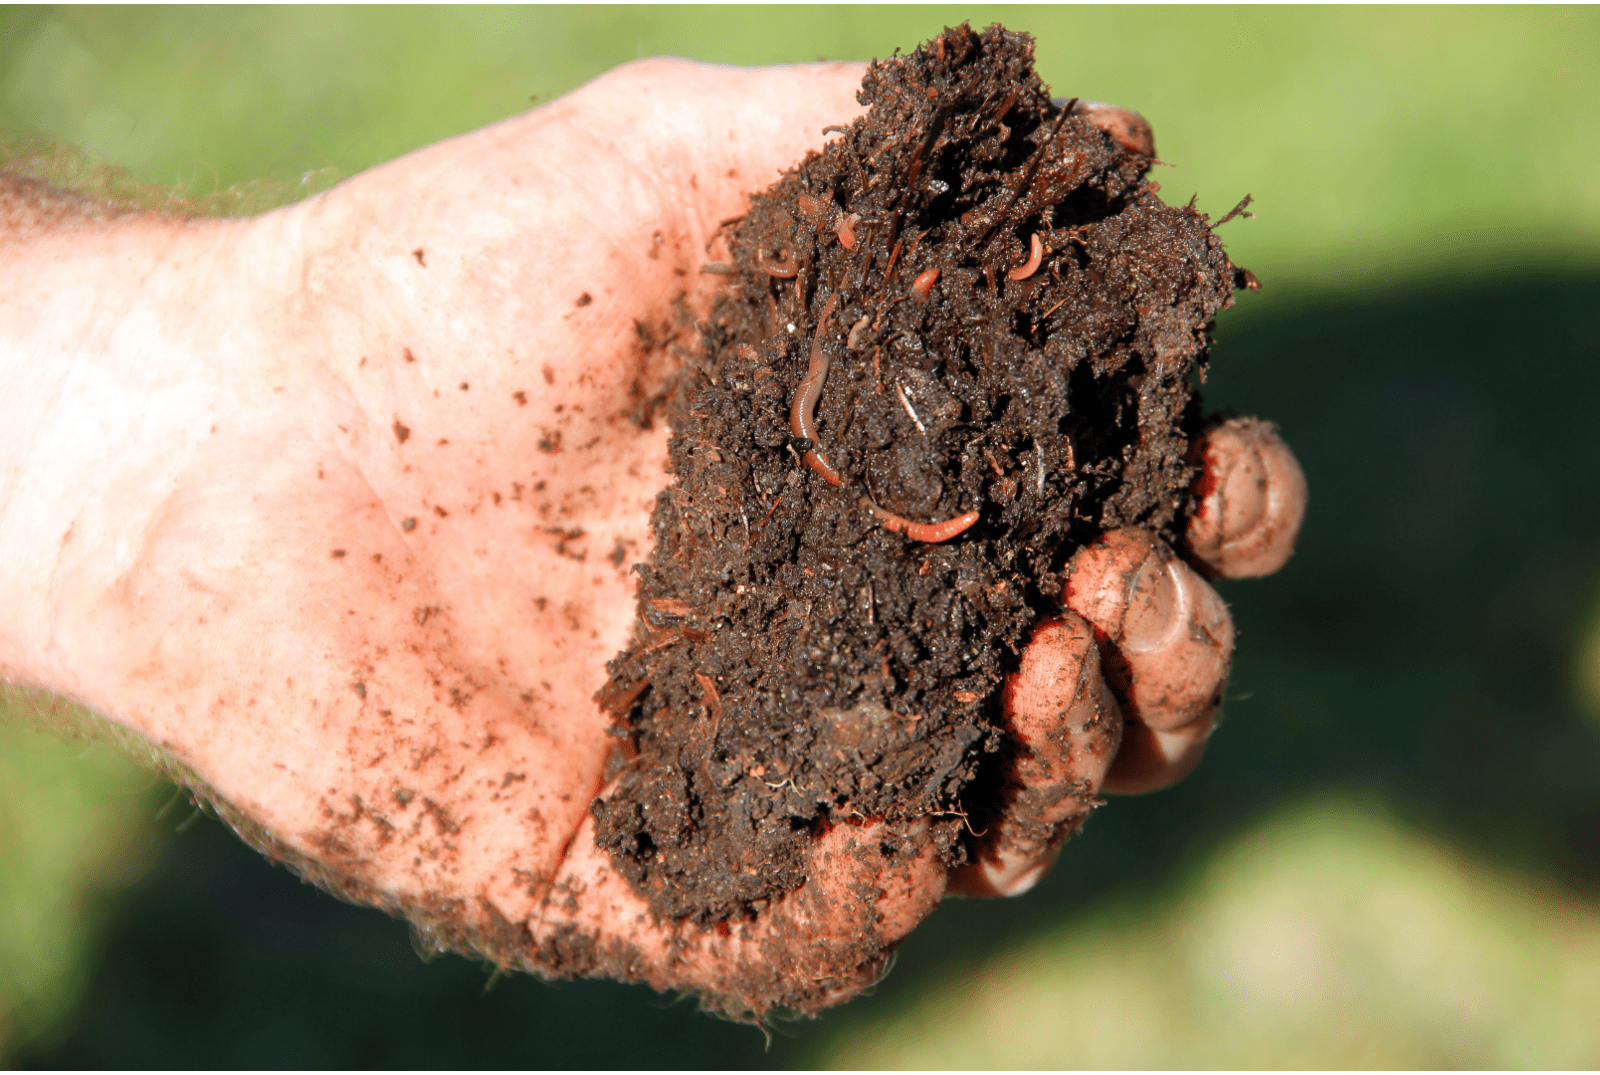 Wormen in compost